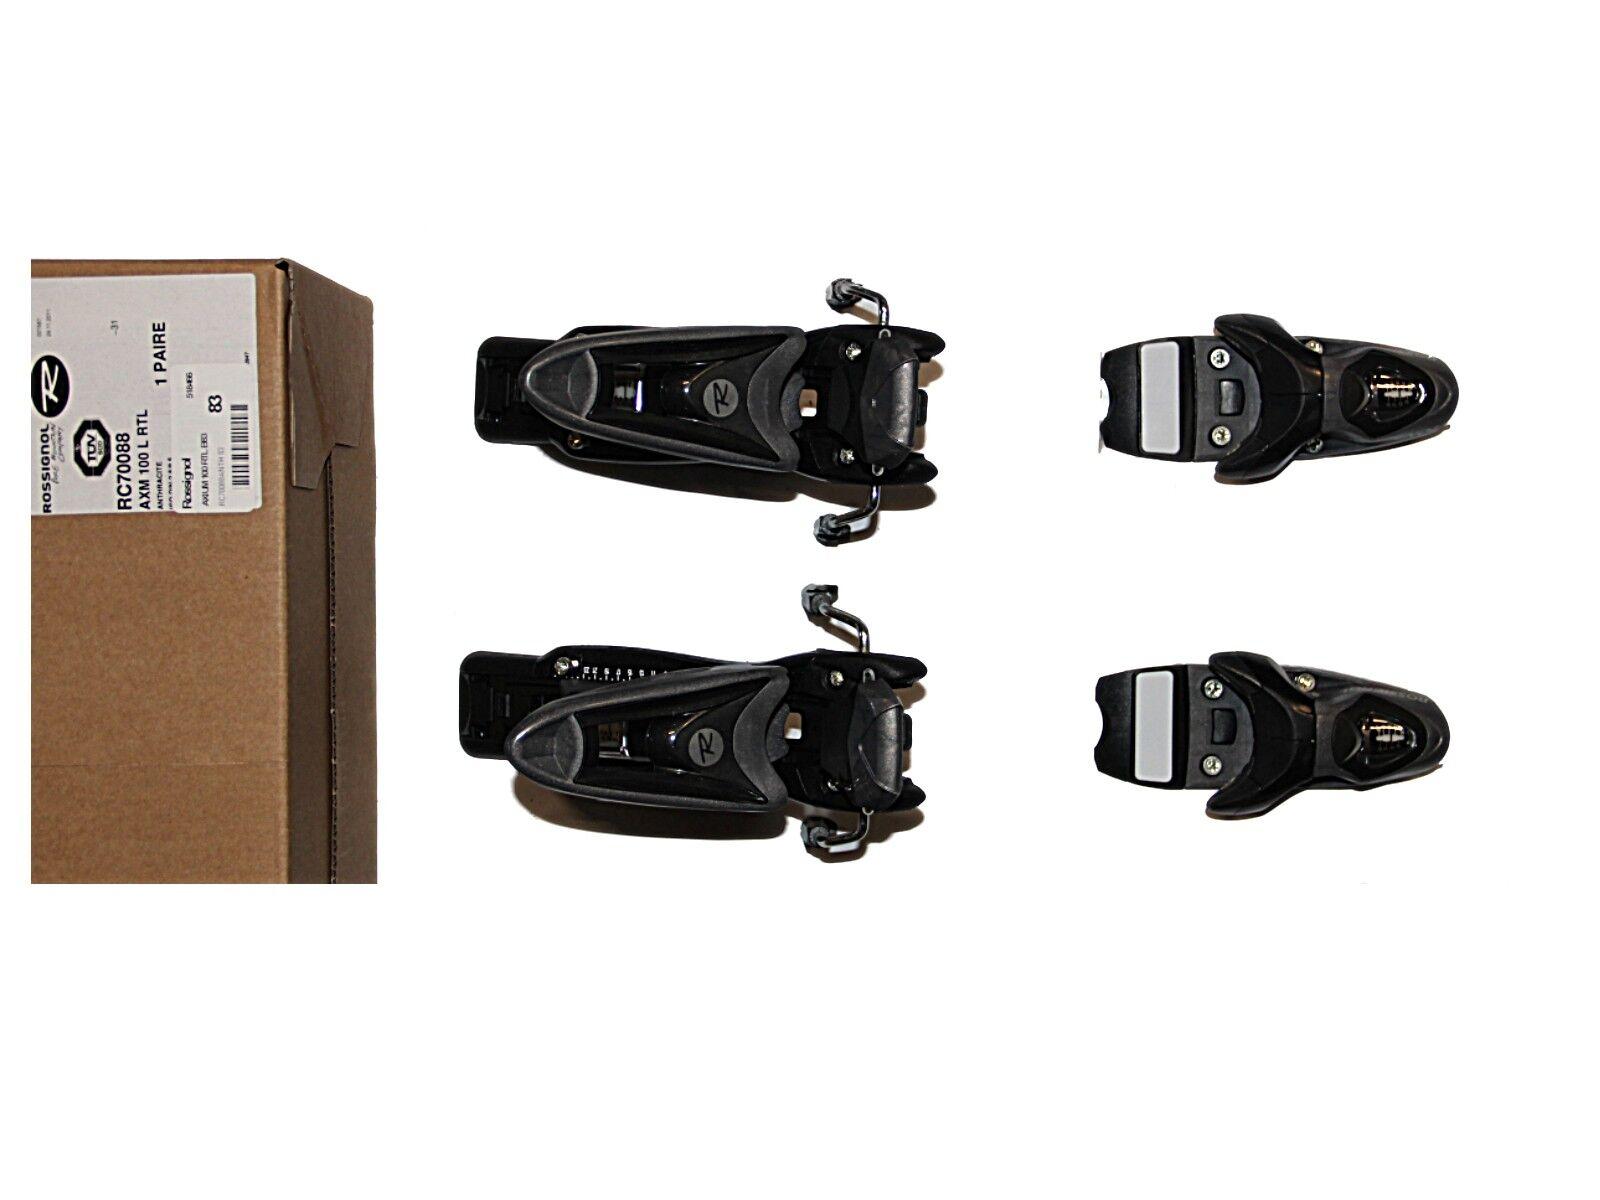 Rossignol  Axium 100 RTL Brake 83mm  alpine downhill Ski Bindings   NEW  stadium giveaways